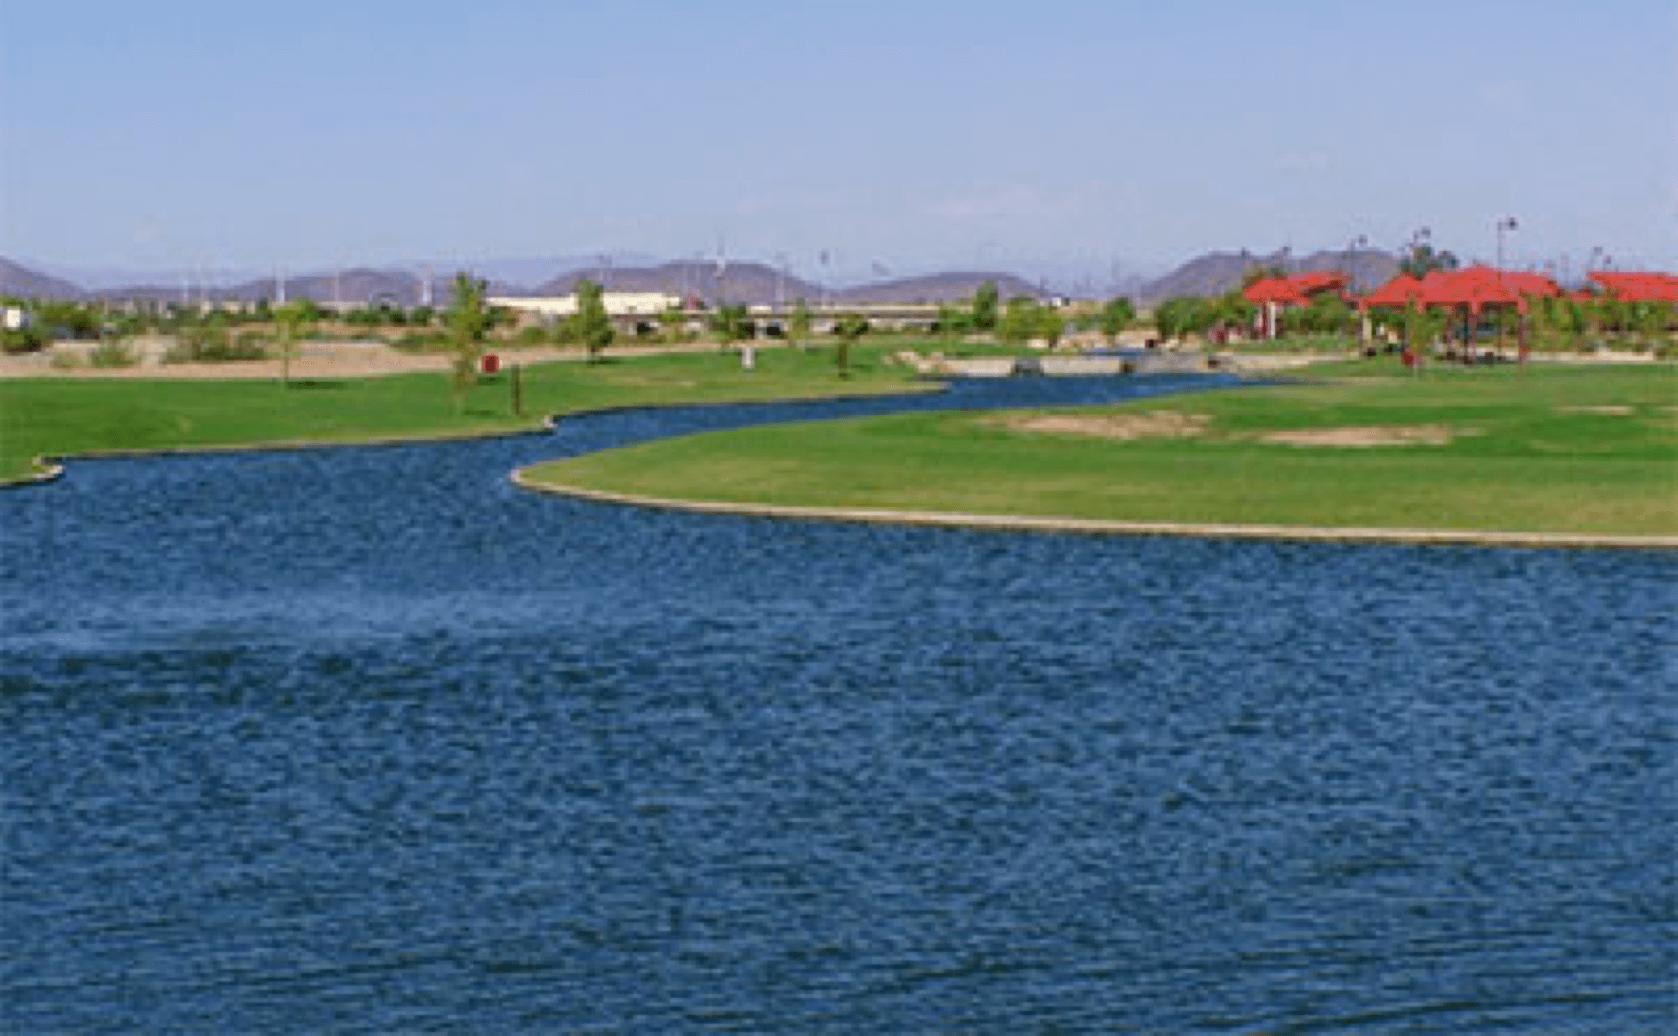 Rio-Vista-Community-Lake-Fishing-Guide-Peoria-AZ-03